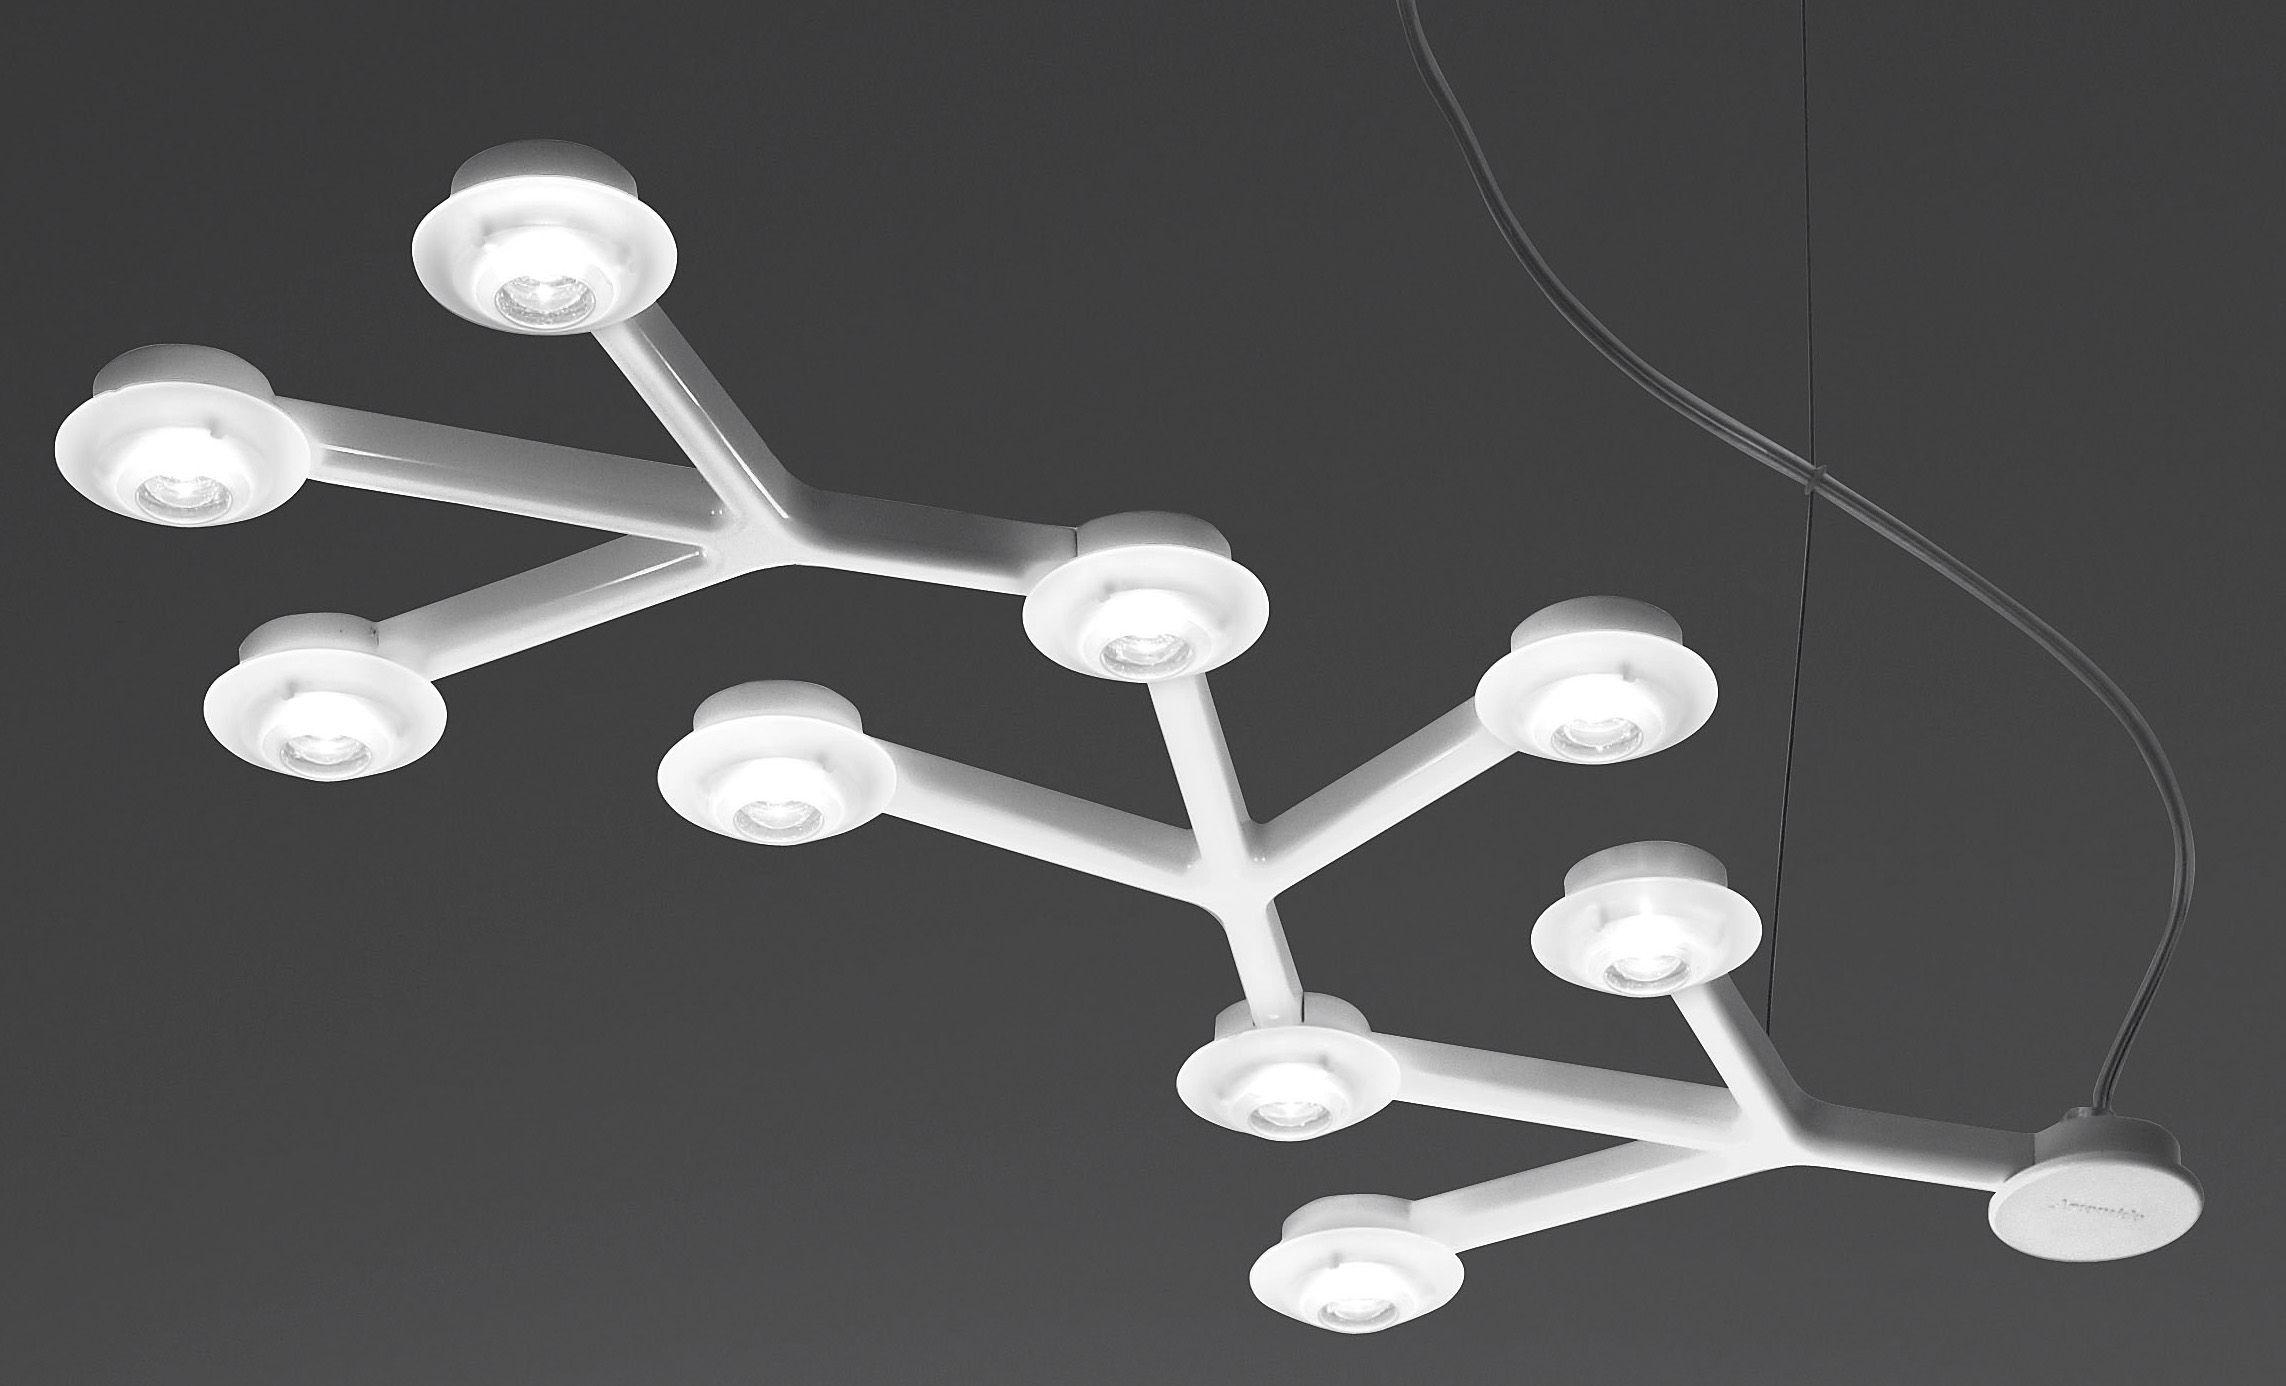 Leuchten - Pendelleuchten - LED NET Pendelleuchte länglich - L 66 cm - Artemide - Weiß - bemaltes Aluminium, Methacrylate